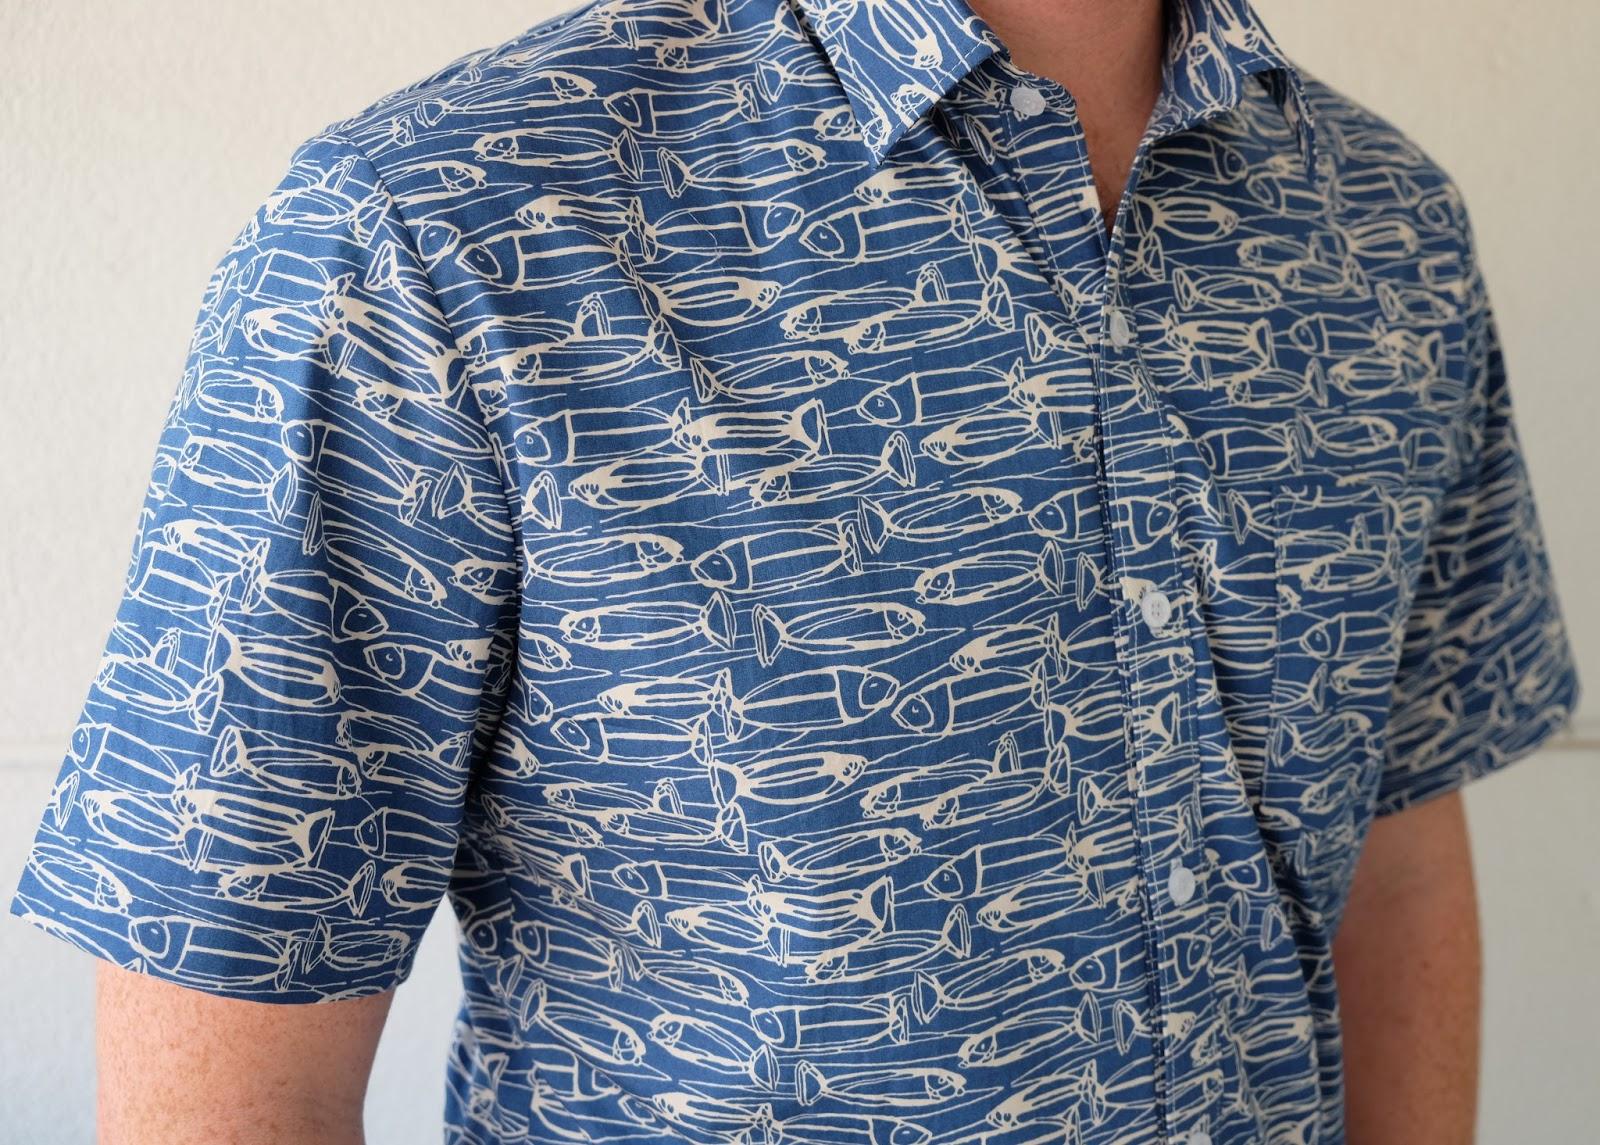 Cookin 39 craftin 39 fish shirt mccall 39 s 6044 for Fish print shirt